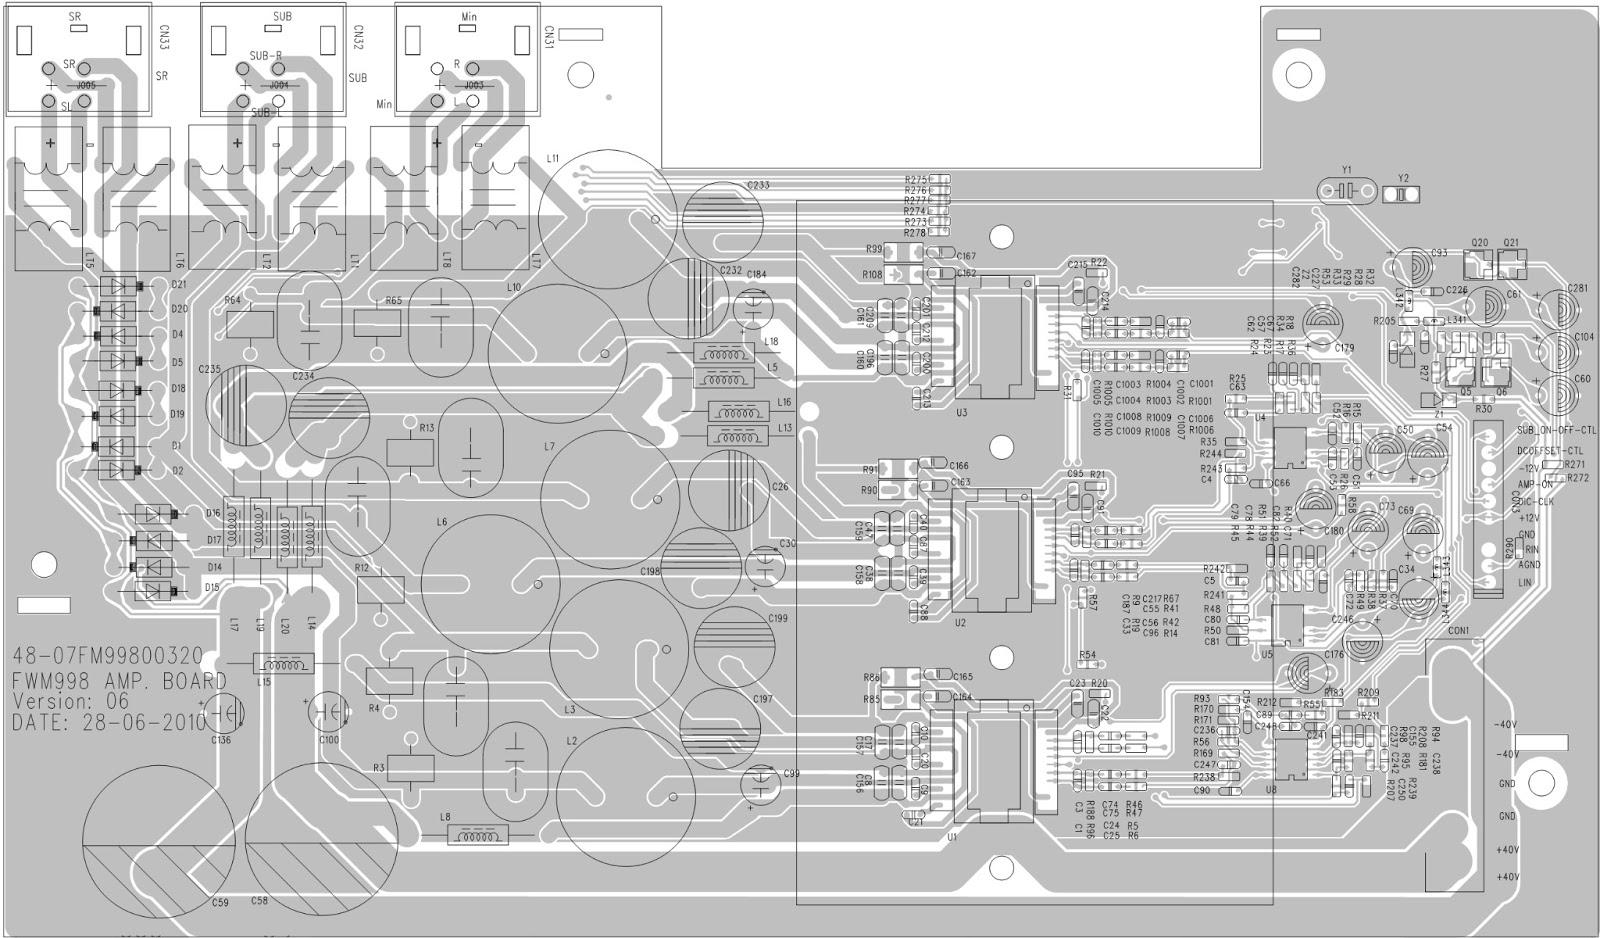 Philips Fwm 998 Circuit Diagram Amplifier Section